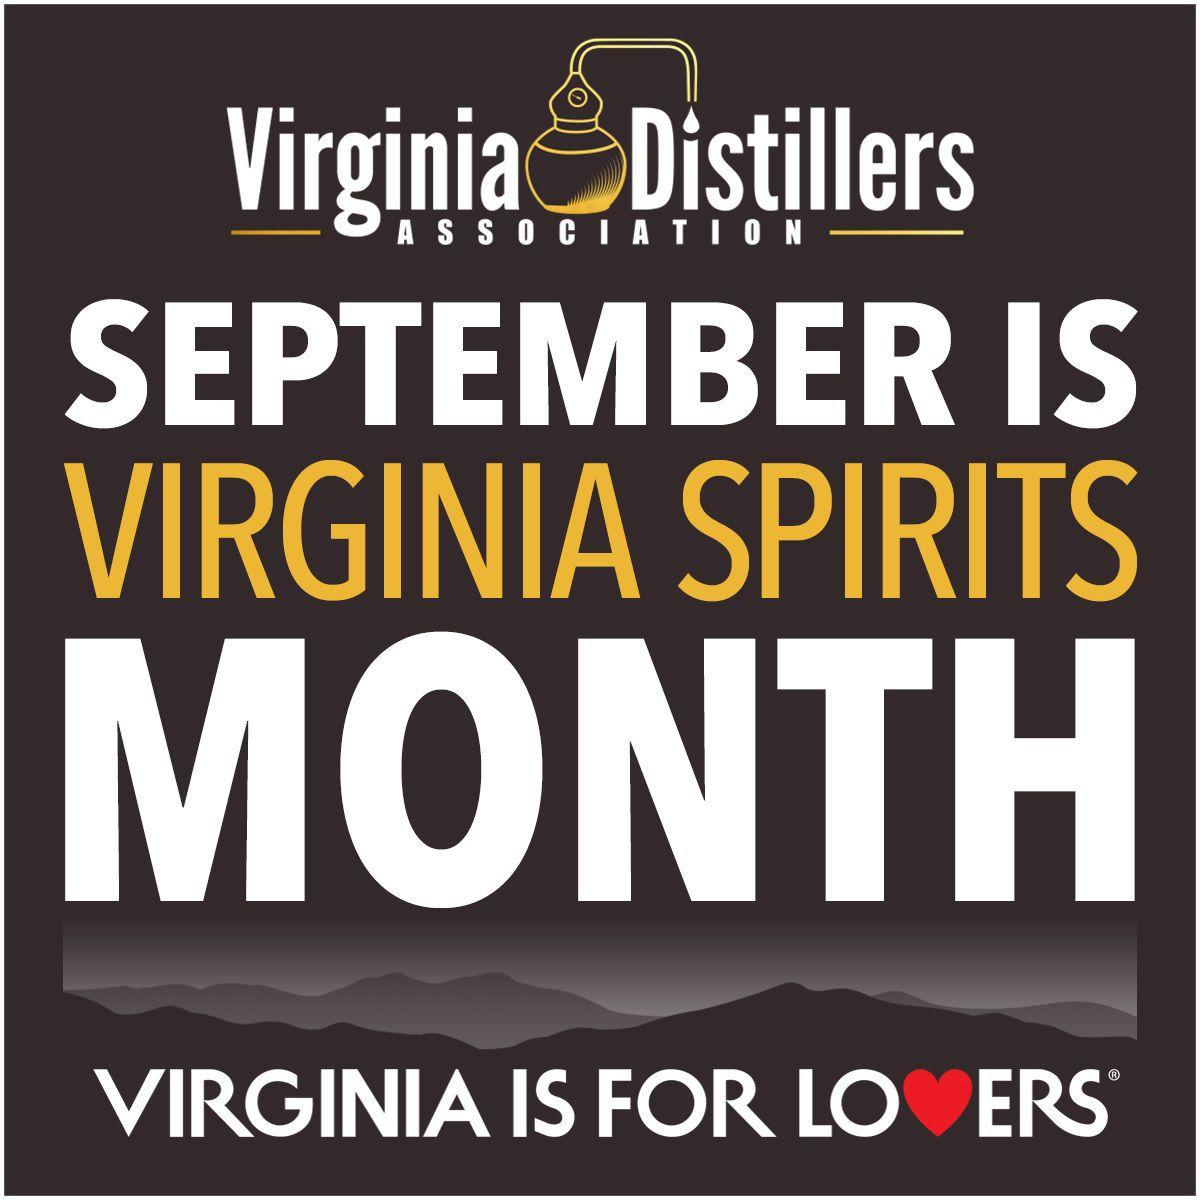 WINE: James River Distillery + Virginia Spirits Month